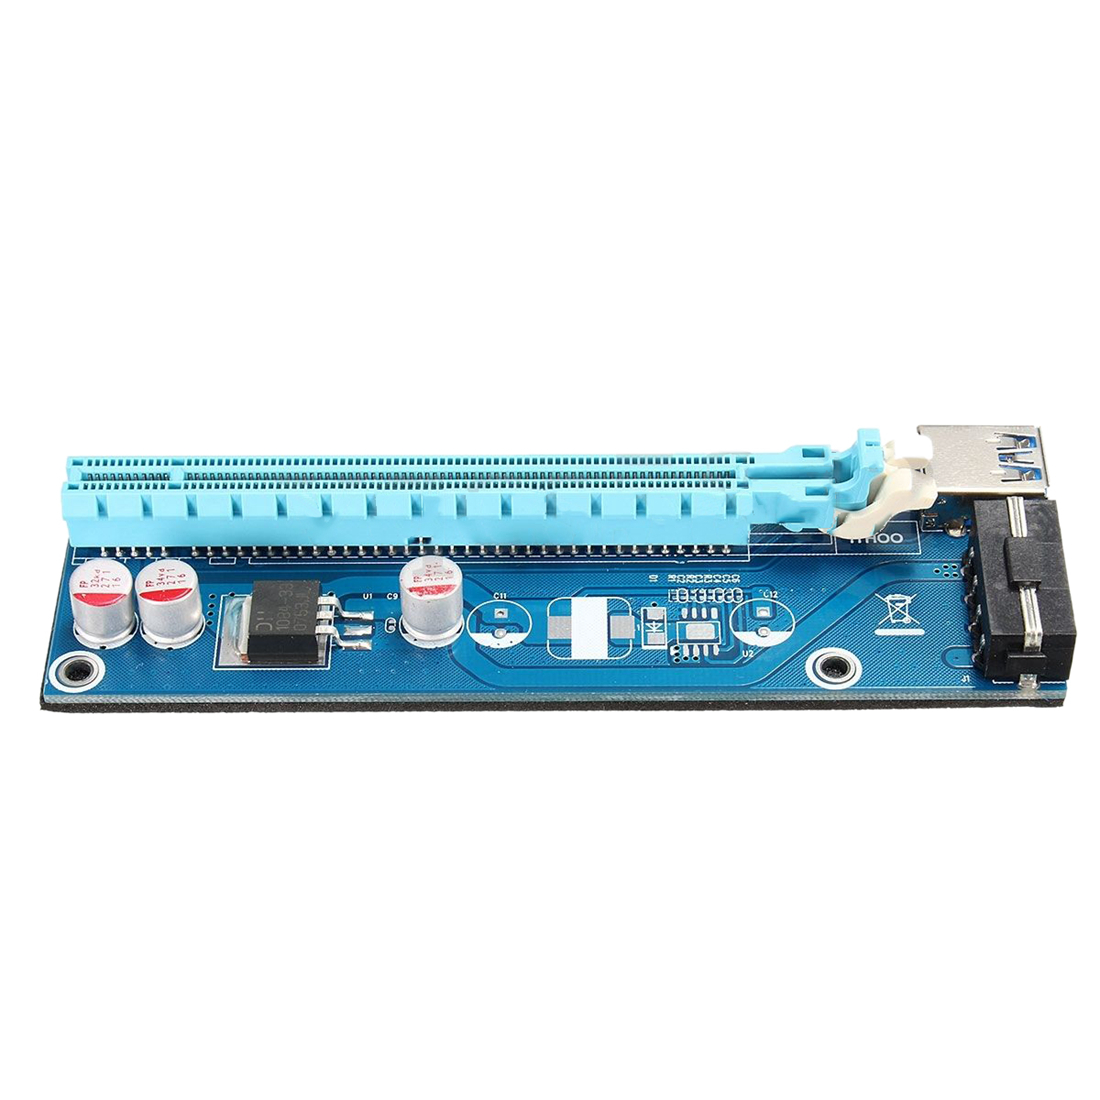 15 Sets USB3.0 PCI-E Express 1x to 16x Extender Riser Card 4Pin SATA Power Cable Blue centechia 1 pc 30cm pci express riser card 1x to 16x usb cable pci e extender sata